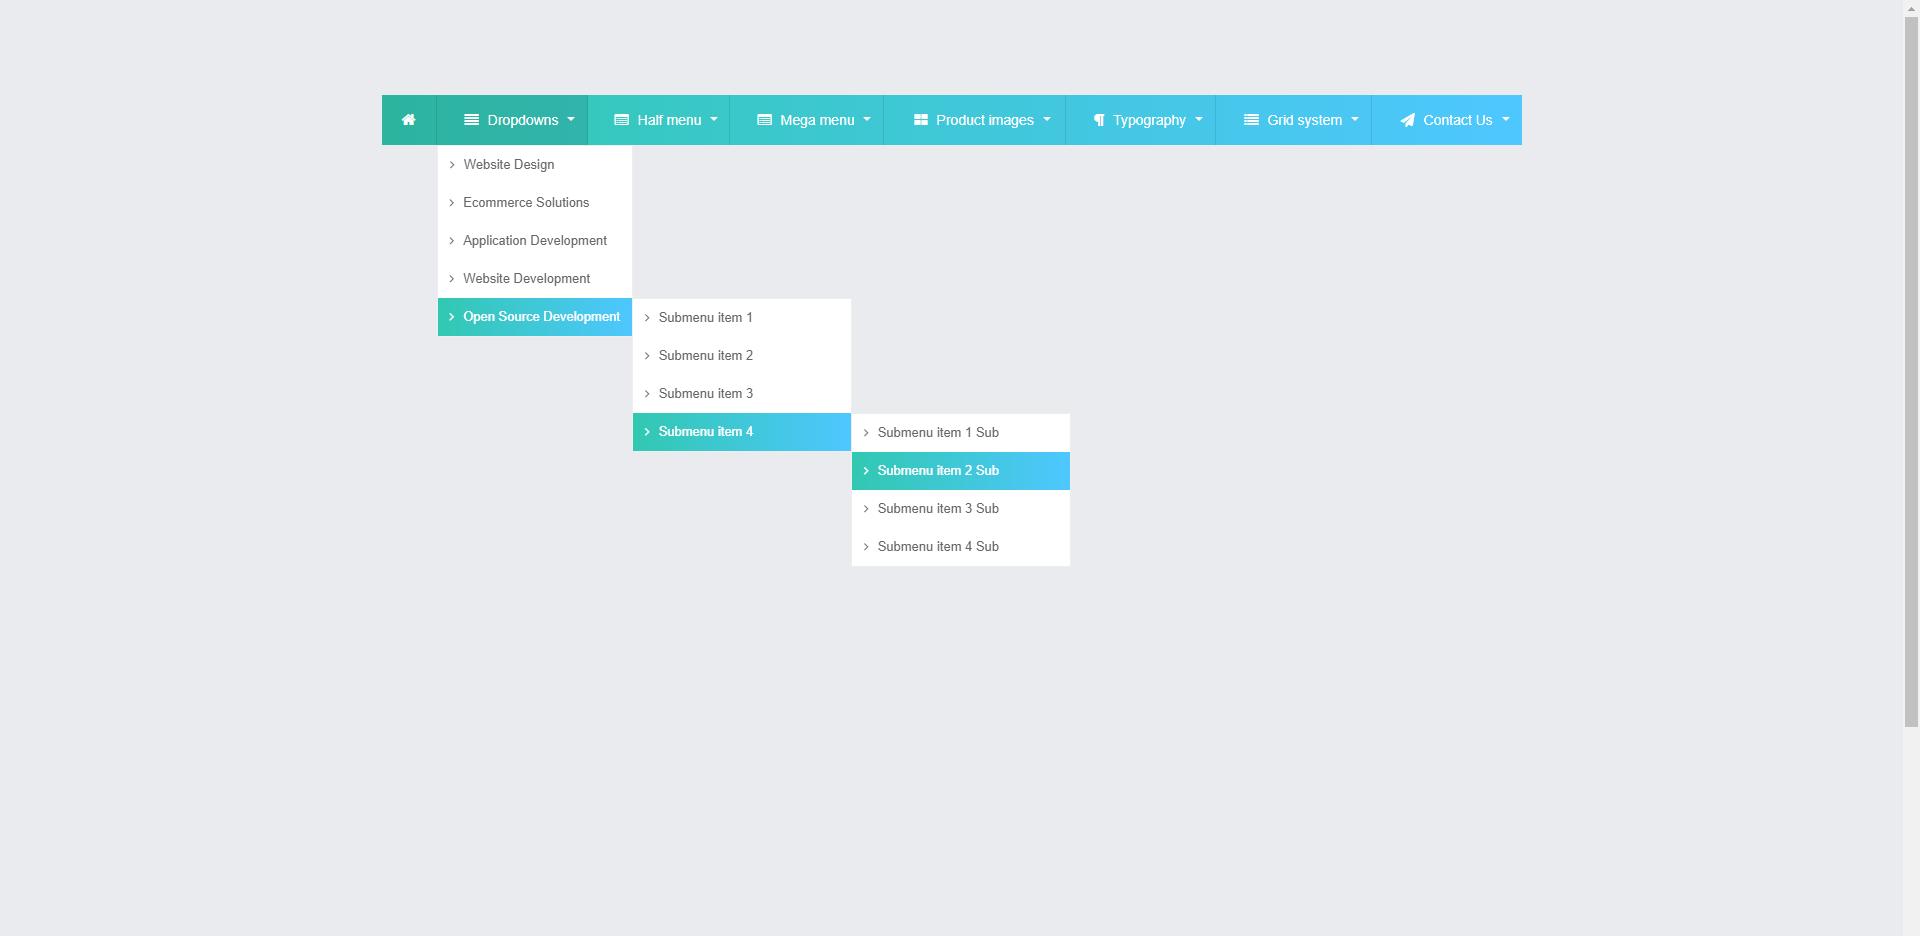 Web Slide - Responsive Megamenu Navigation Sub Dropdown Menu